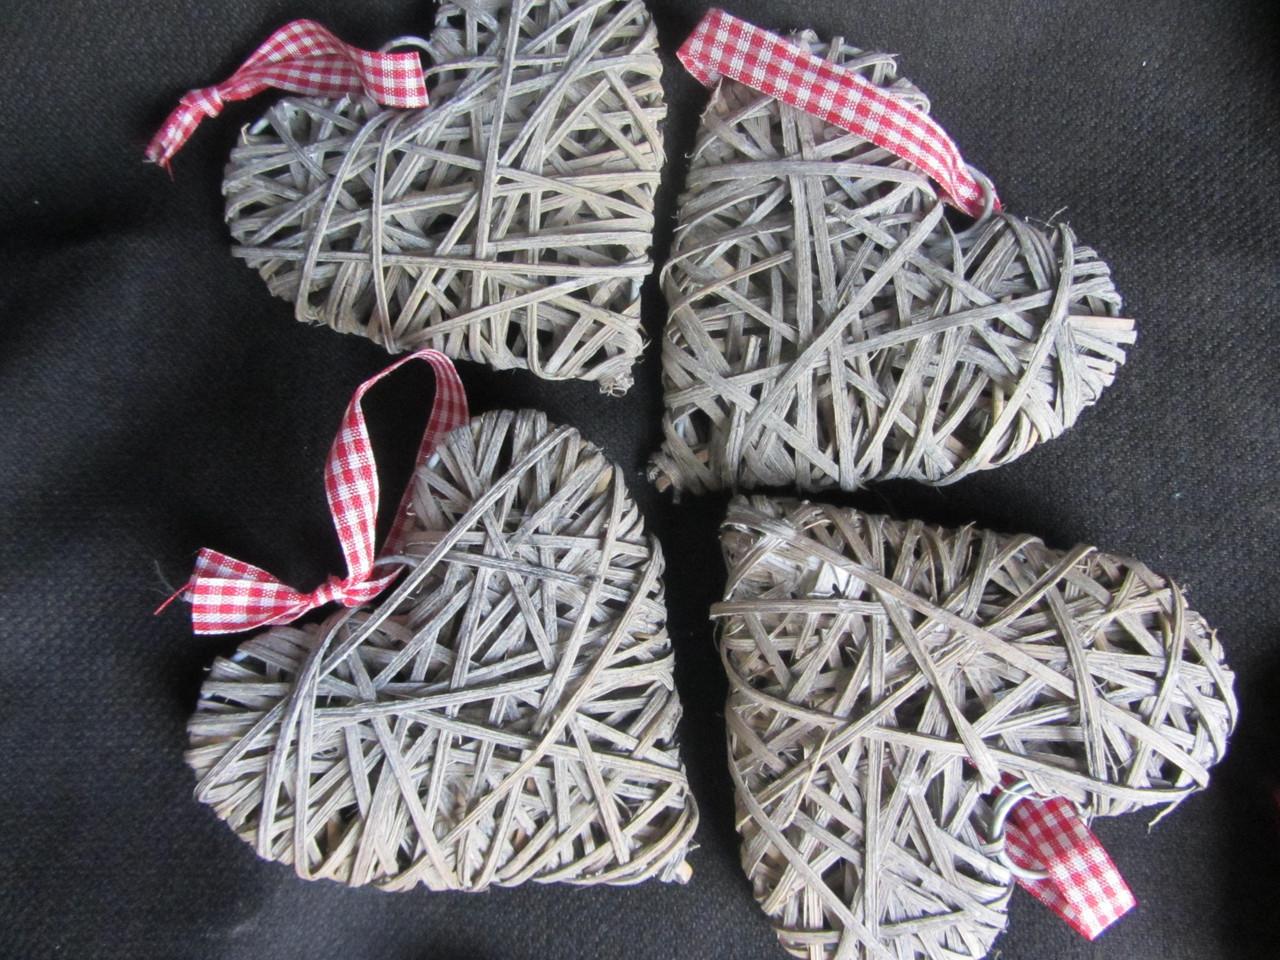 Сердечко пепельное из ротанга, 9,5х9 см (25/20) (цена за 1 шт. + 5 гр.)